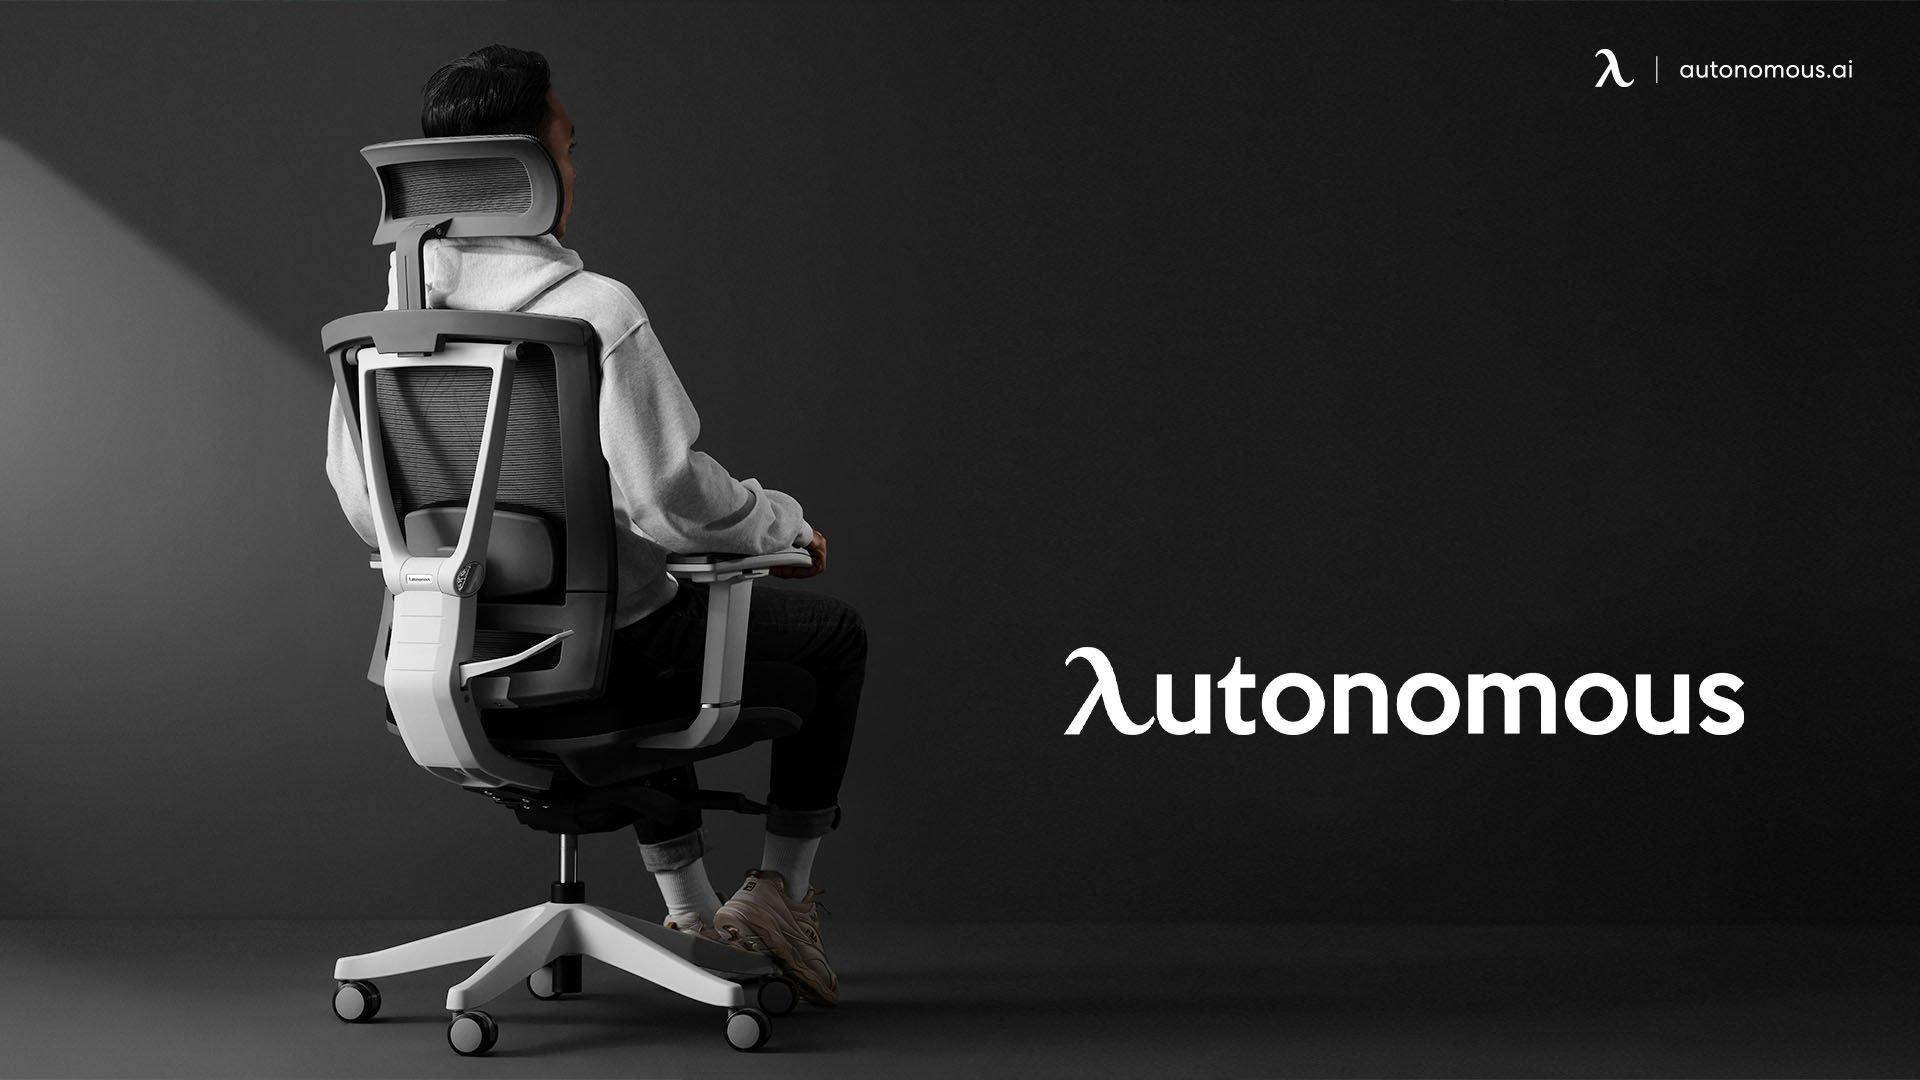 Autonomous: The Best Place to Find an Office Chair Online